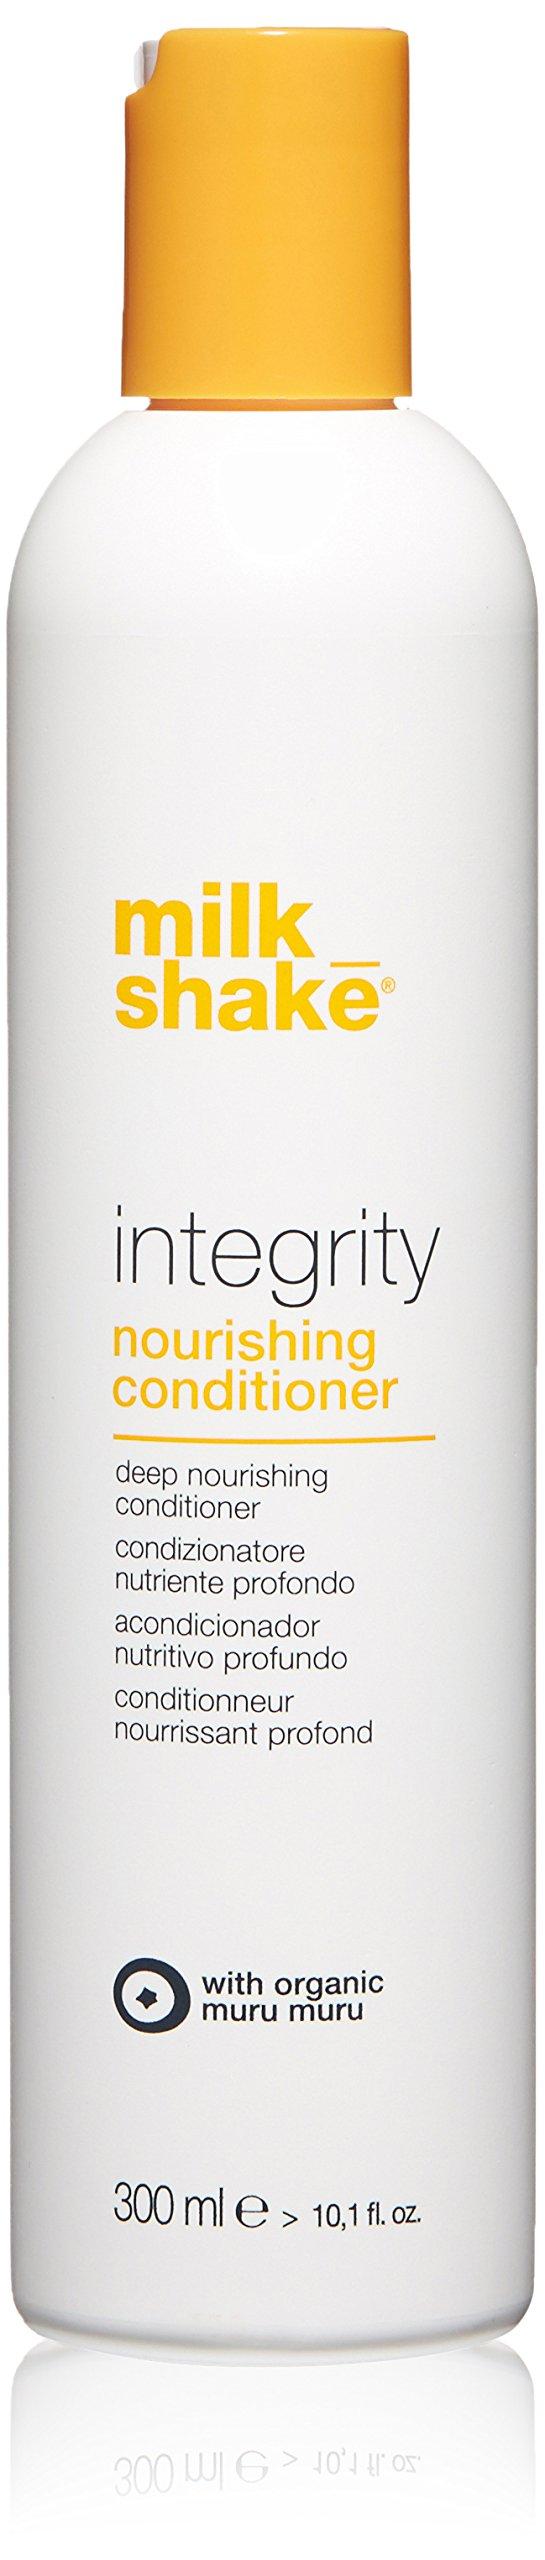 e0bee088c8 Amazon.com  milk shake Integrity Nourishing Shampoo